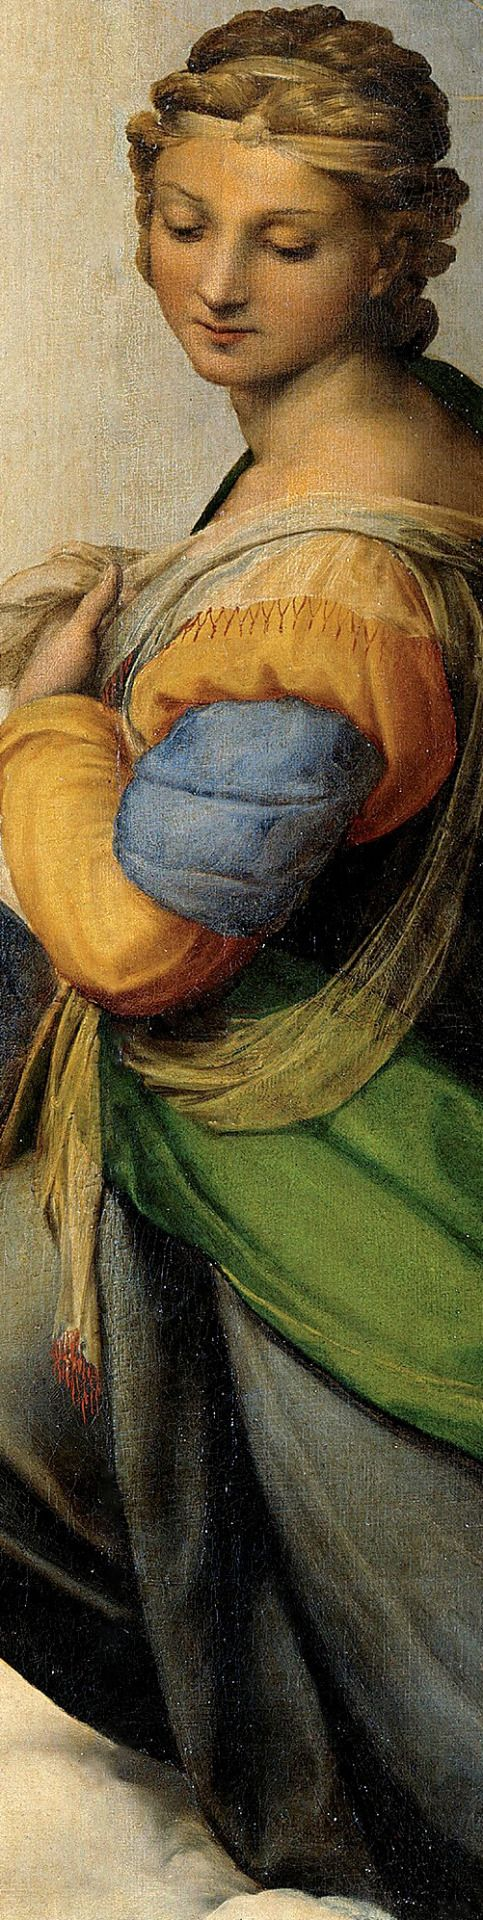 Raphael. Detail from: La Madonna di San Sisto- Sistine Madonna 1513-14